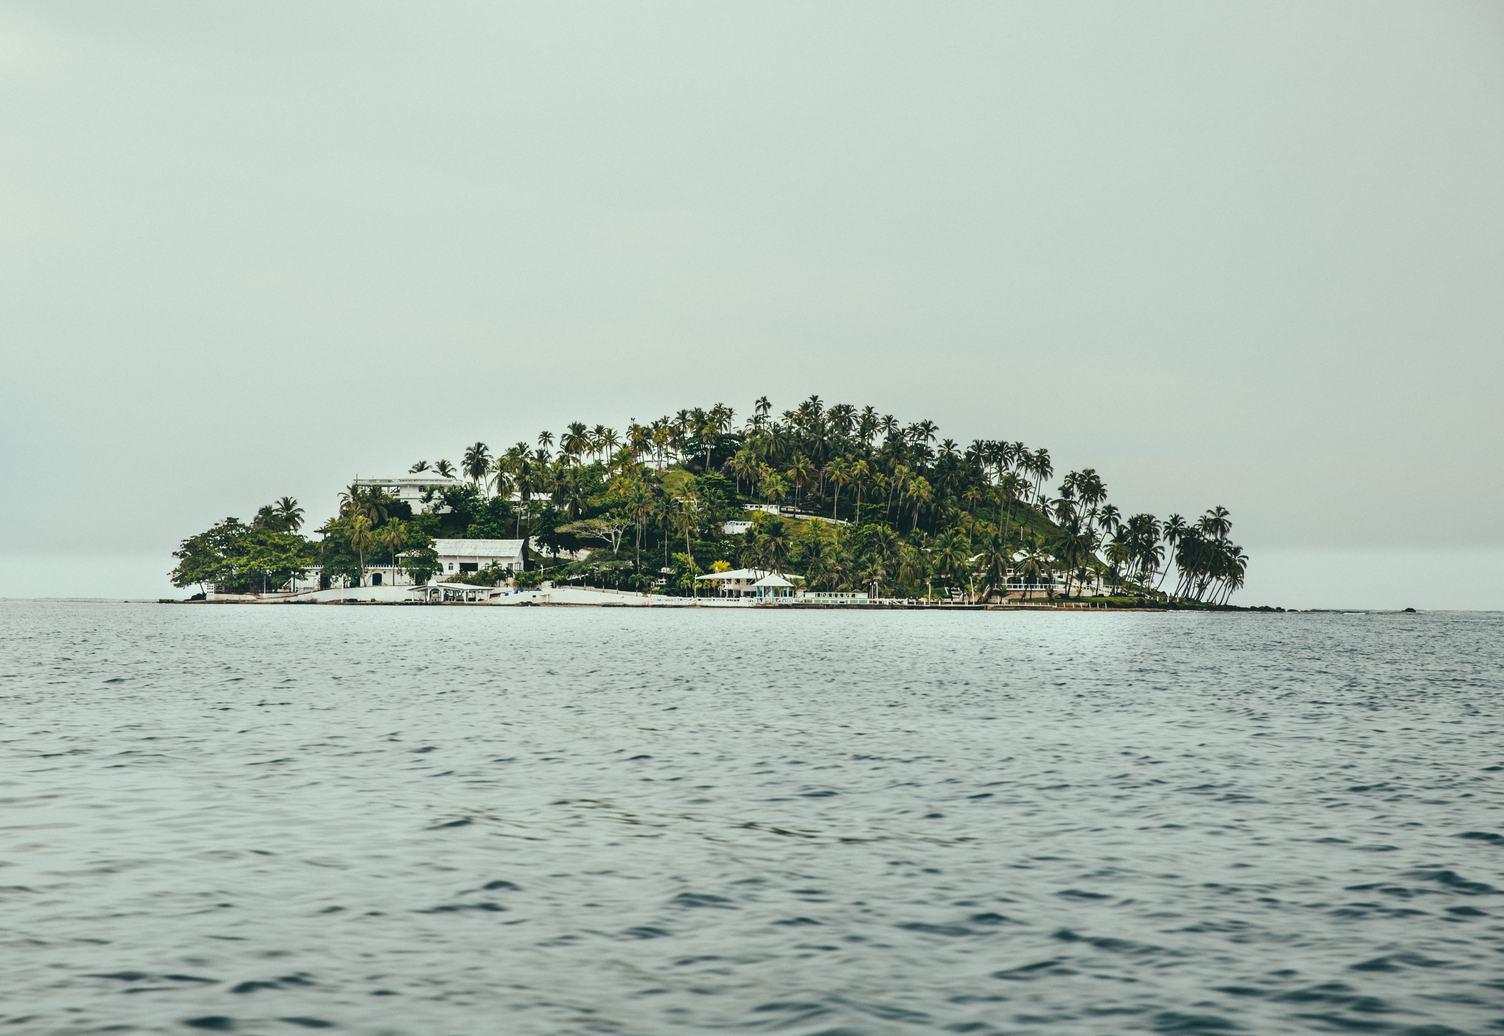 Small Tropical Island in the Caribbean Sea near Panama